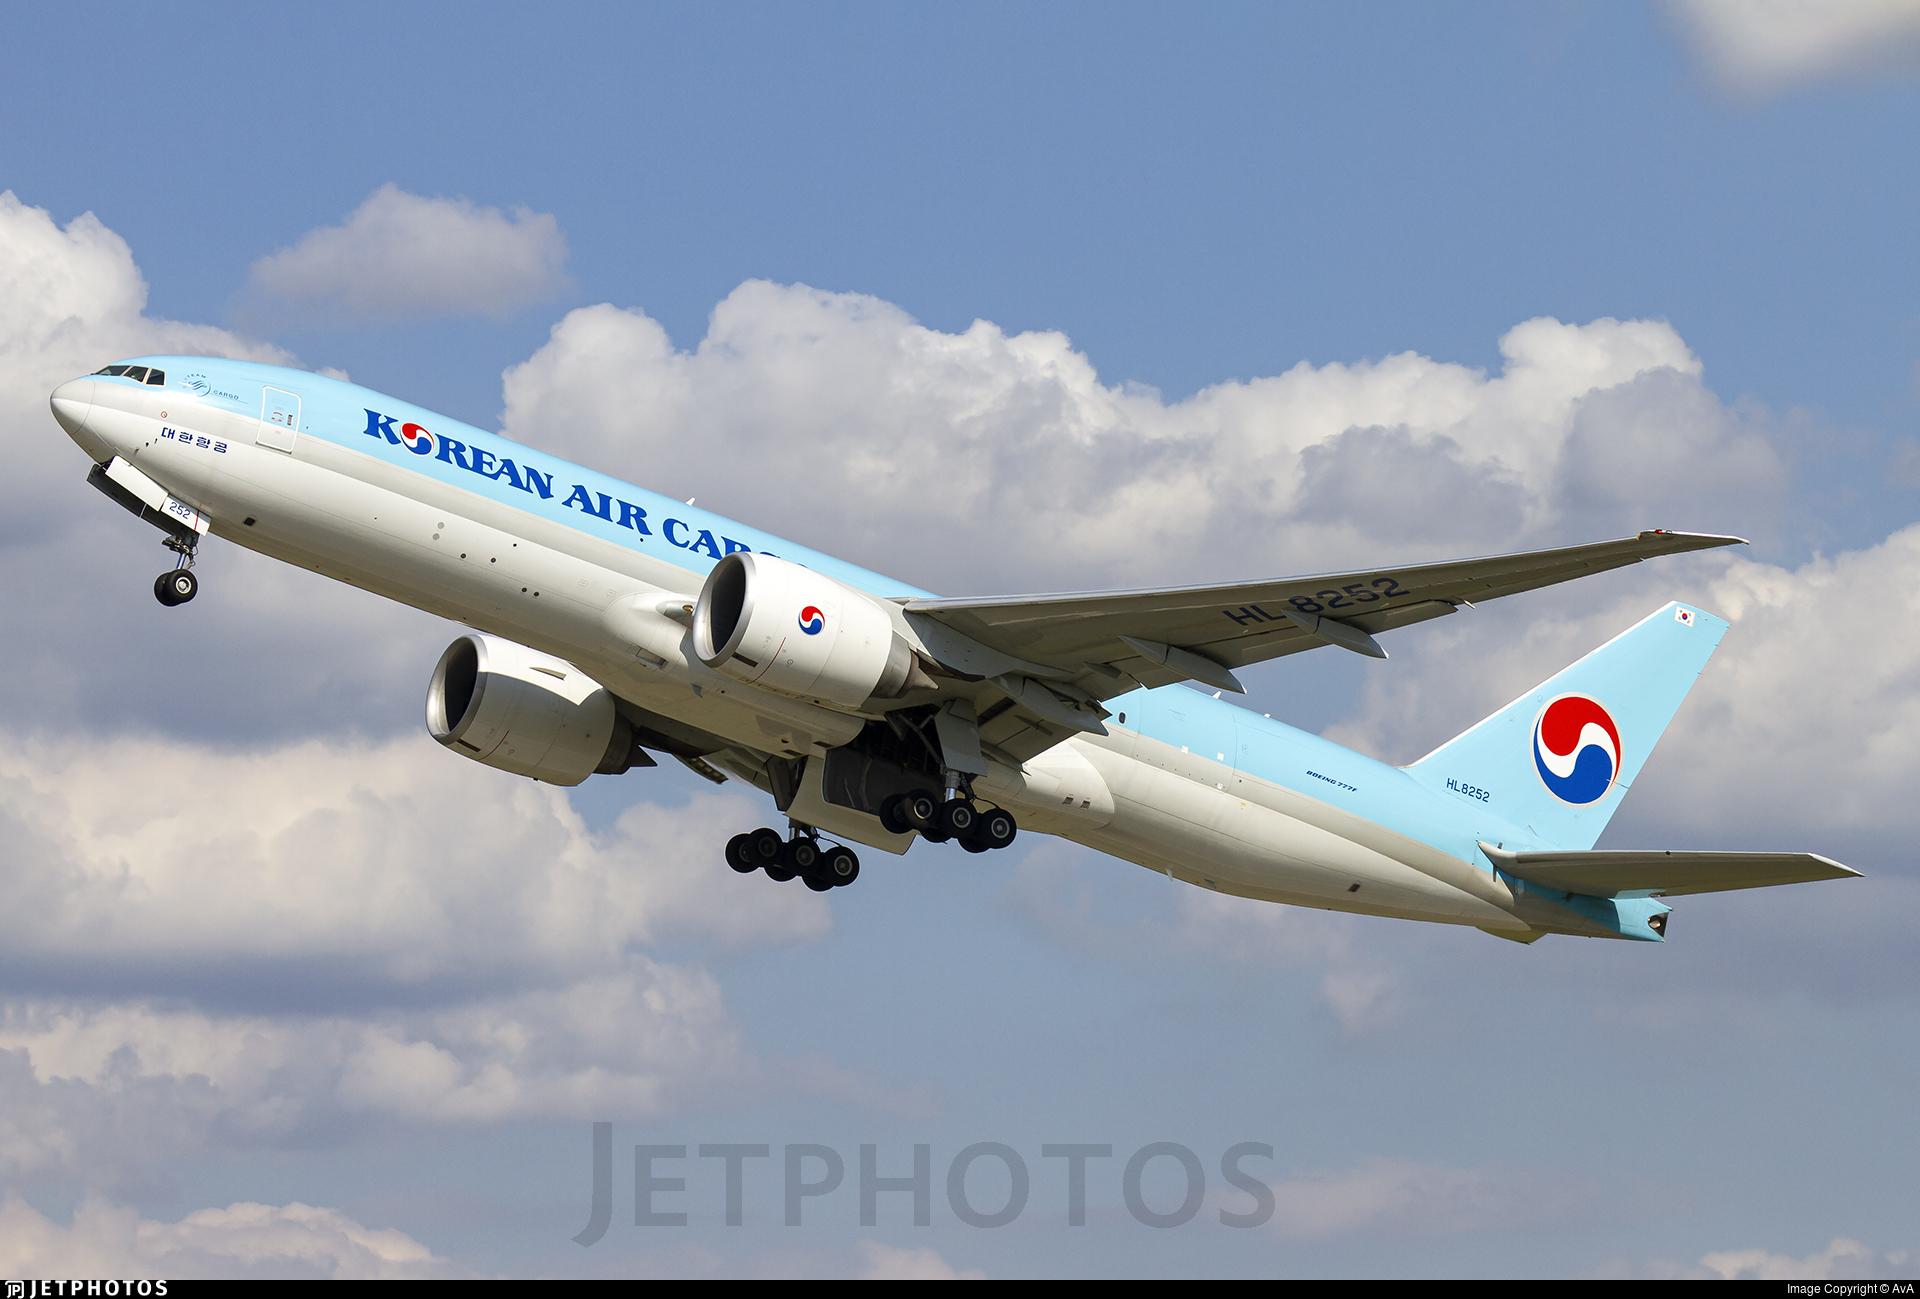 HL8252 - Boeing 777-FB5 - Korean Air Cargo